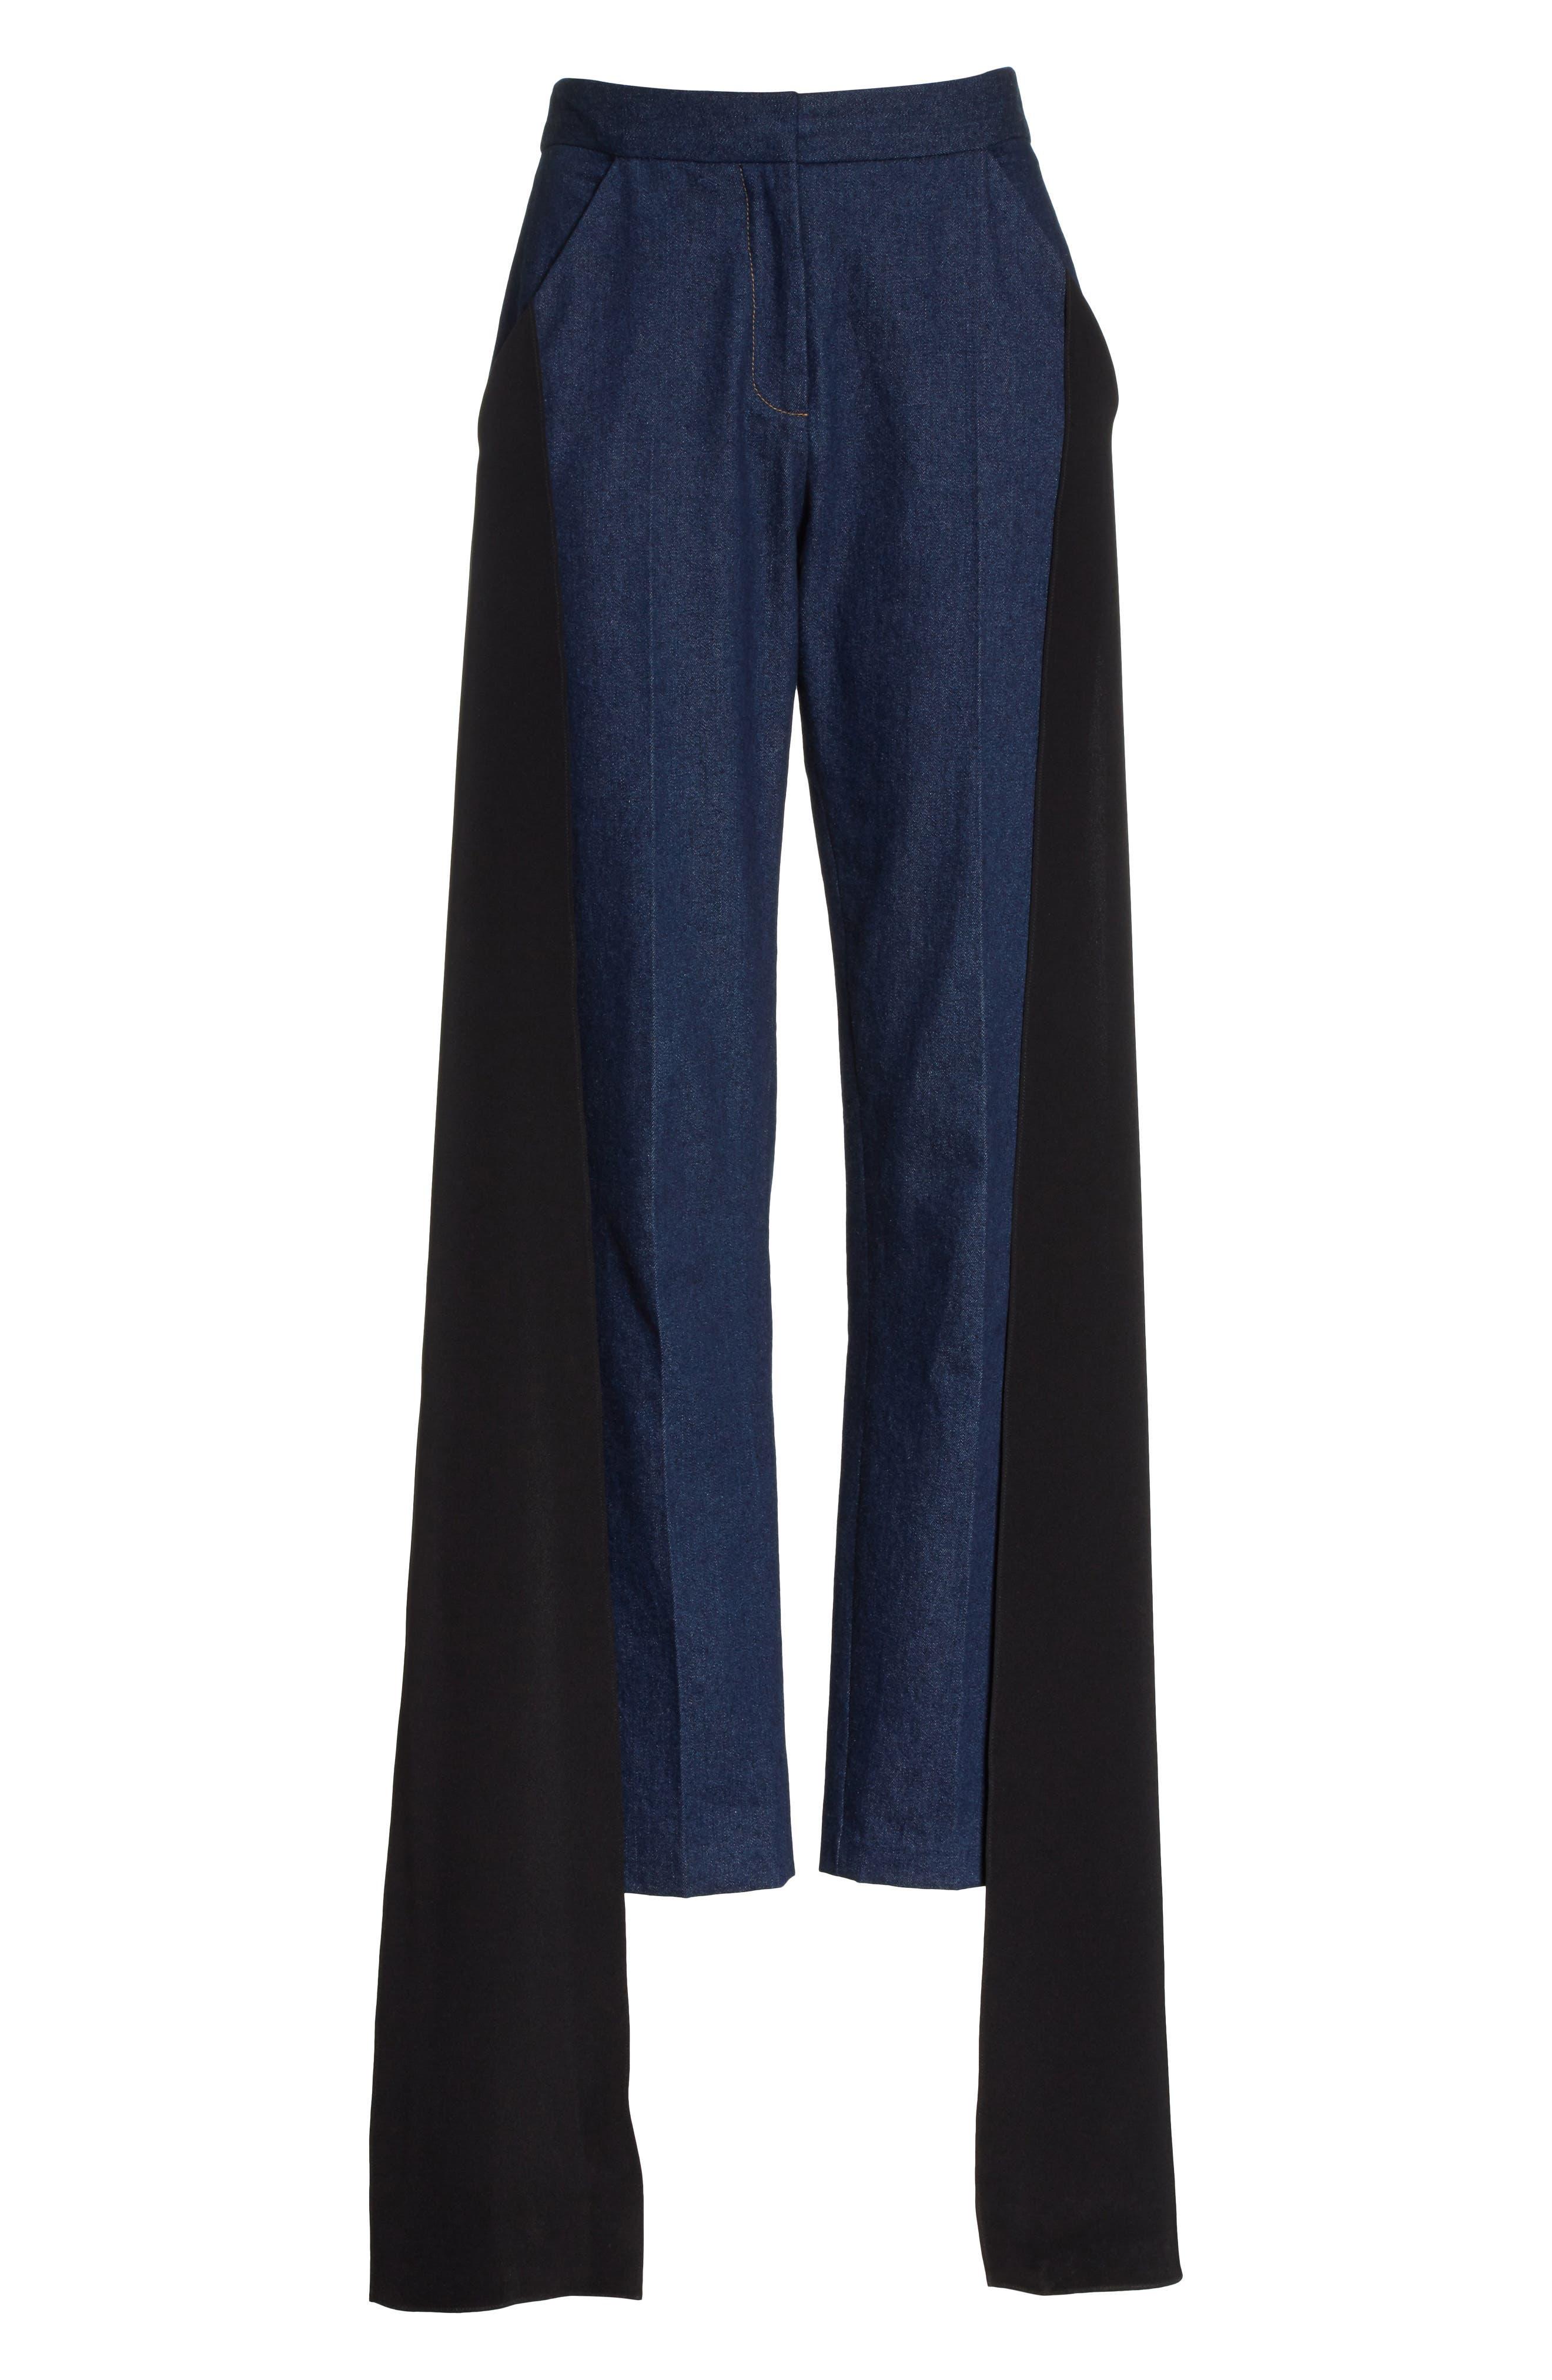 Mojave Side Panel Skinny Jeans,                             Alternate thumbnail 6, color,